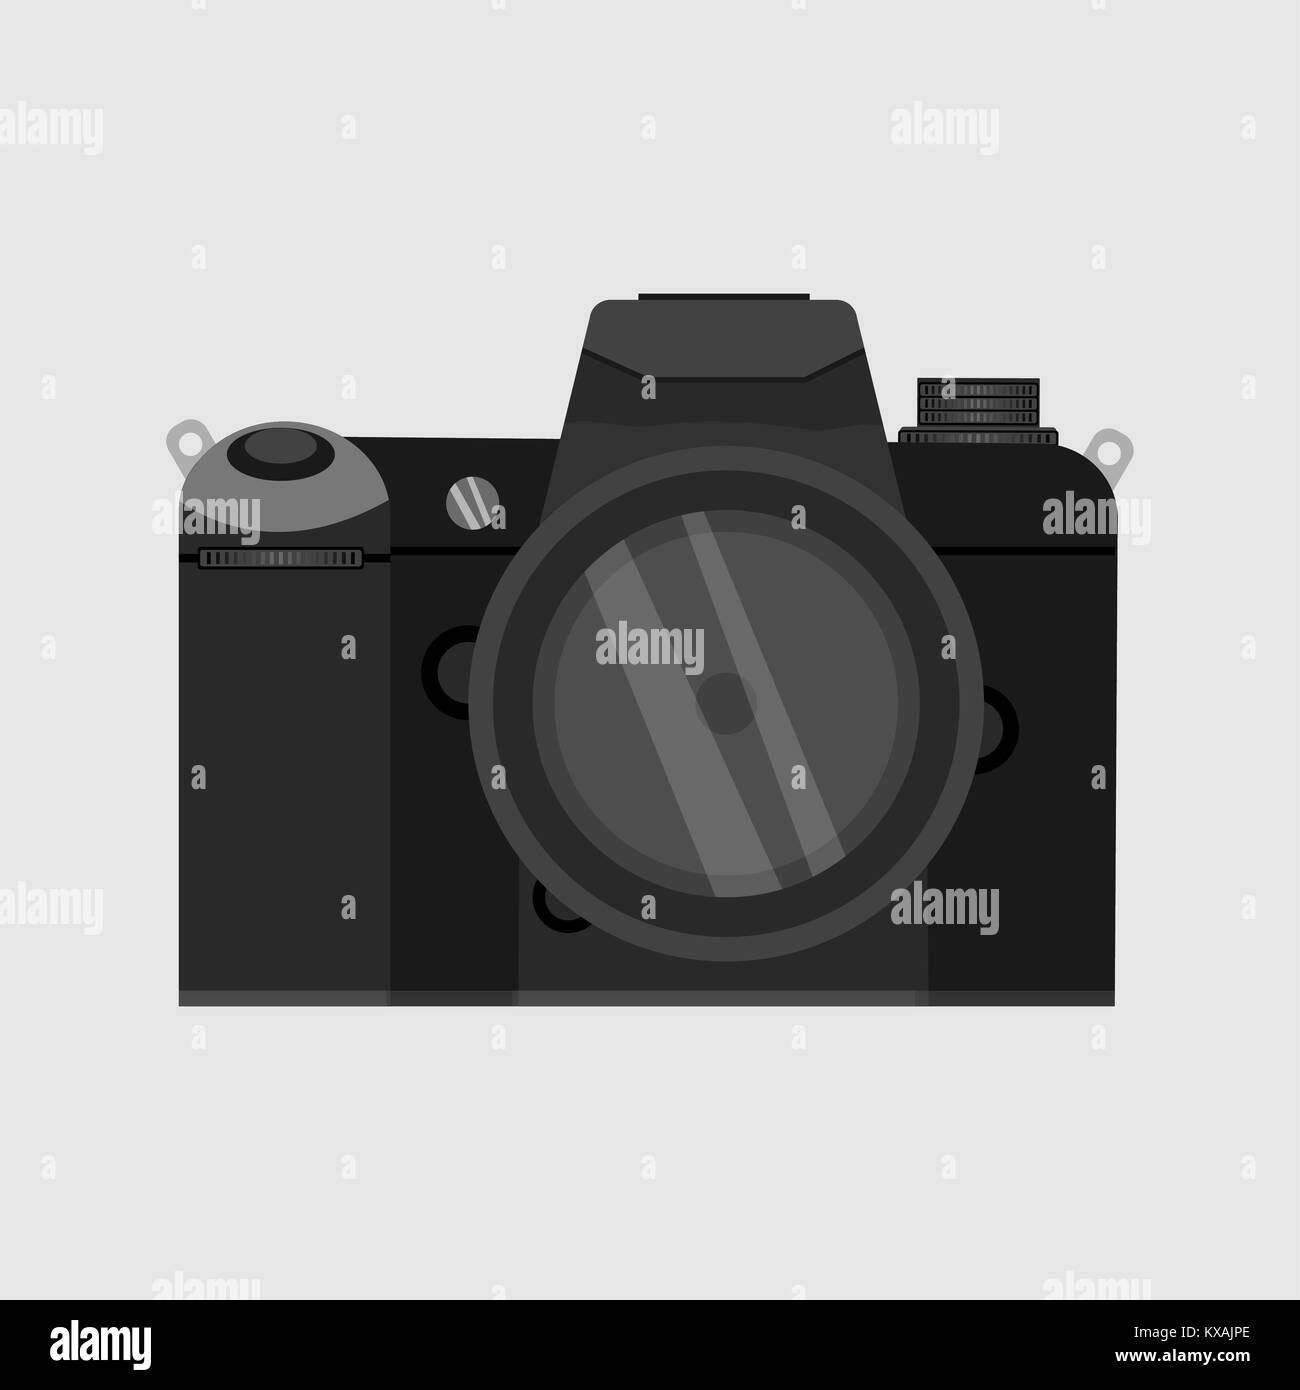 SLR camera ,Photo camera illustration - Stock Image